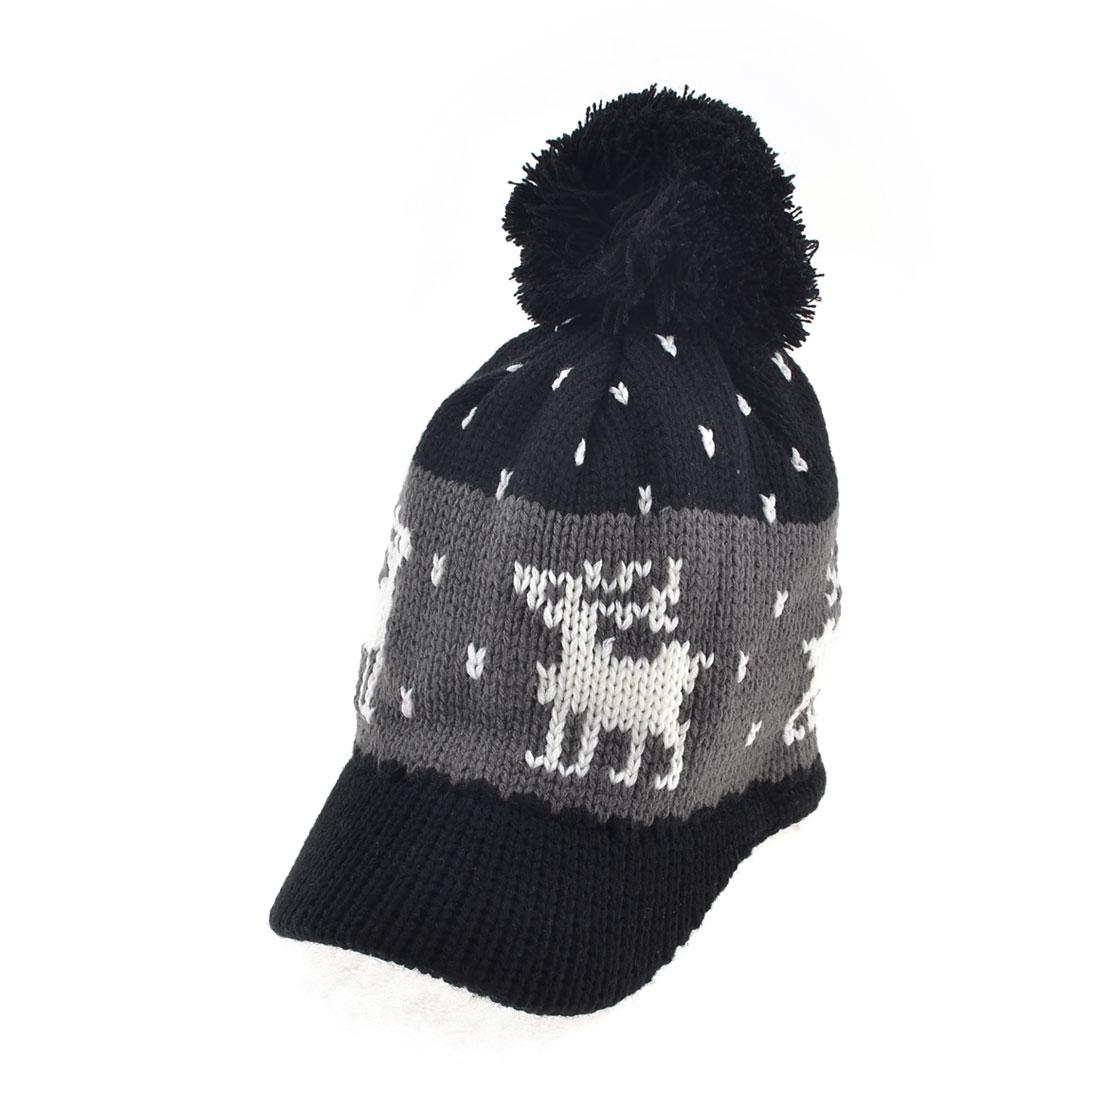 Woman Pom Pom Top Nordic Pattern Knitted Warm Visor Hat Cap Black